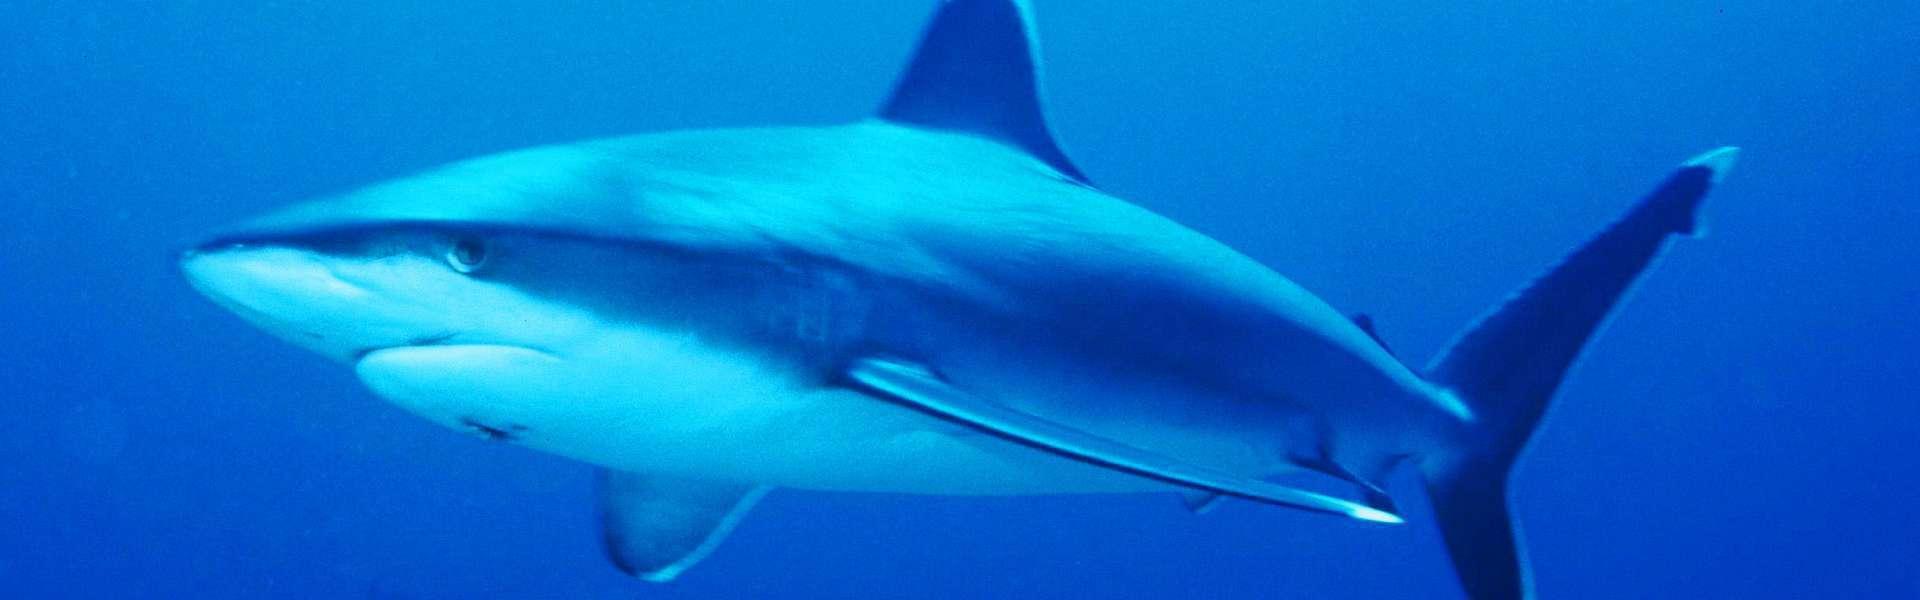 Requins en Méditerranée